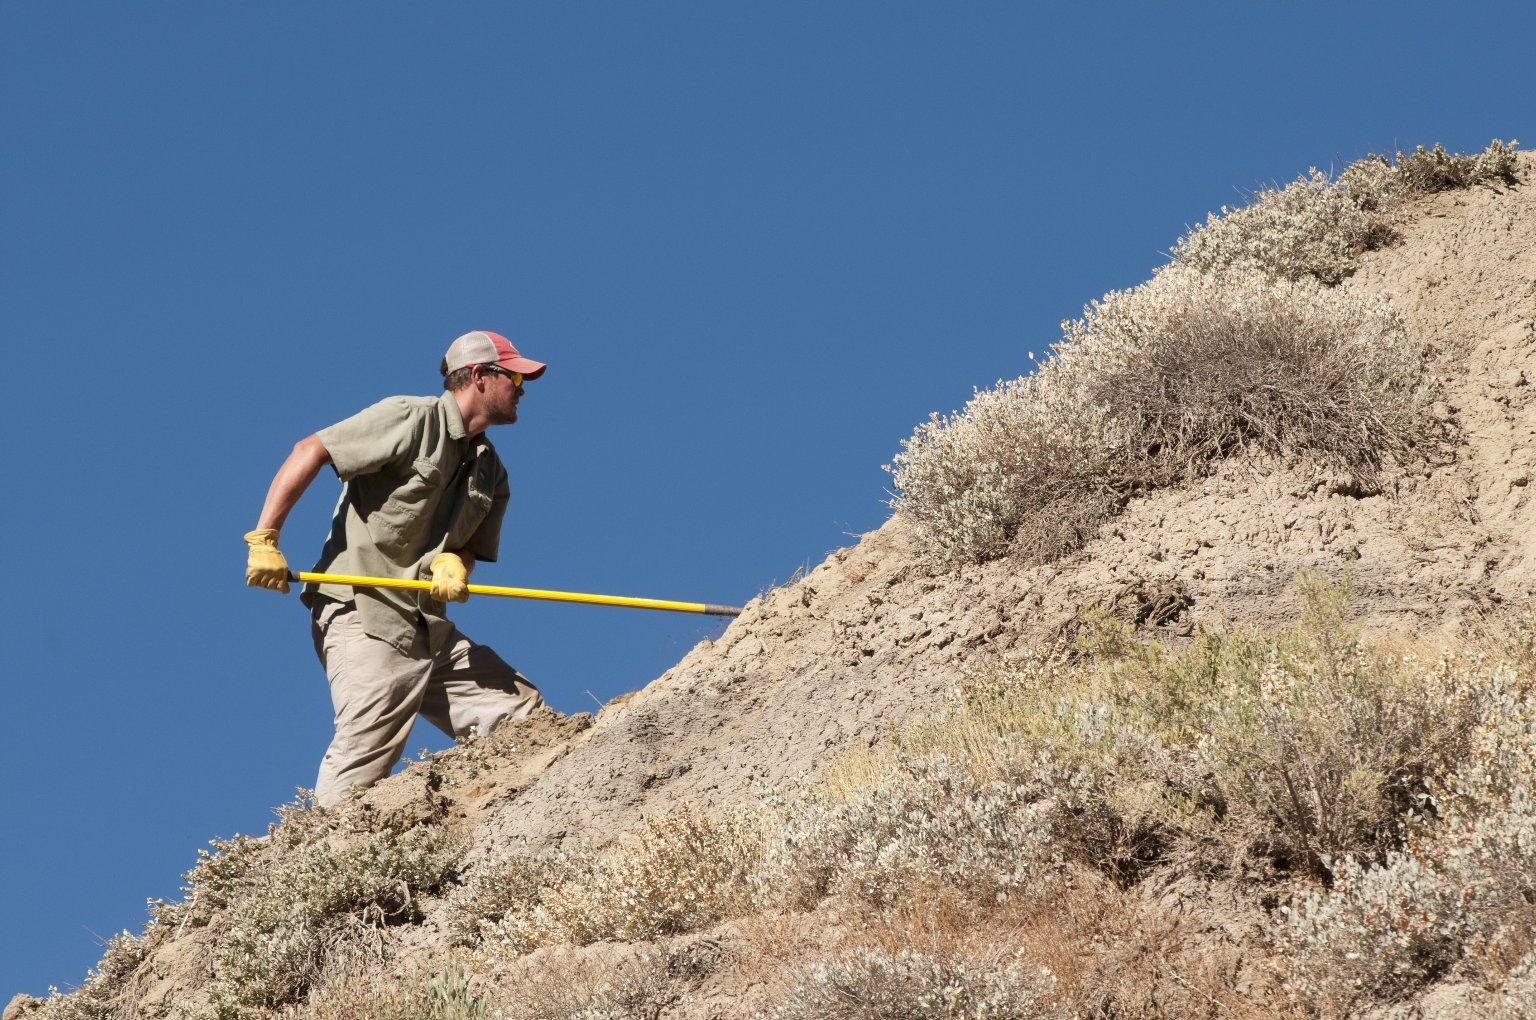 DMNS Volunteer Dane Miller works on a dig site in the Kaiparowits Plateau.